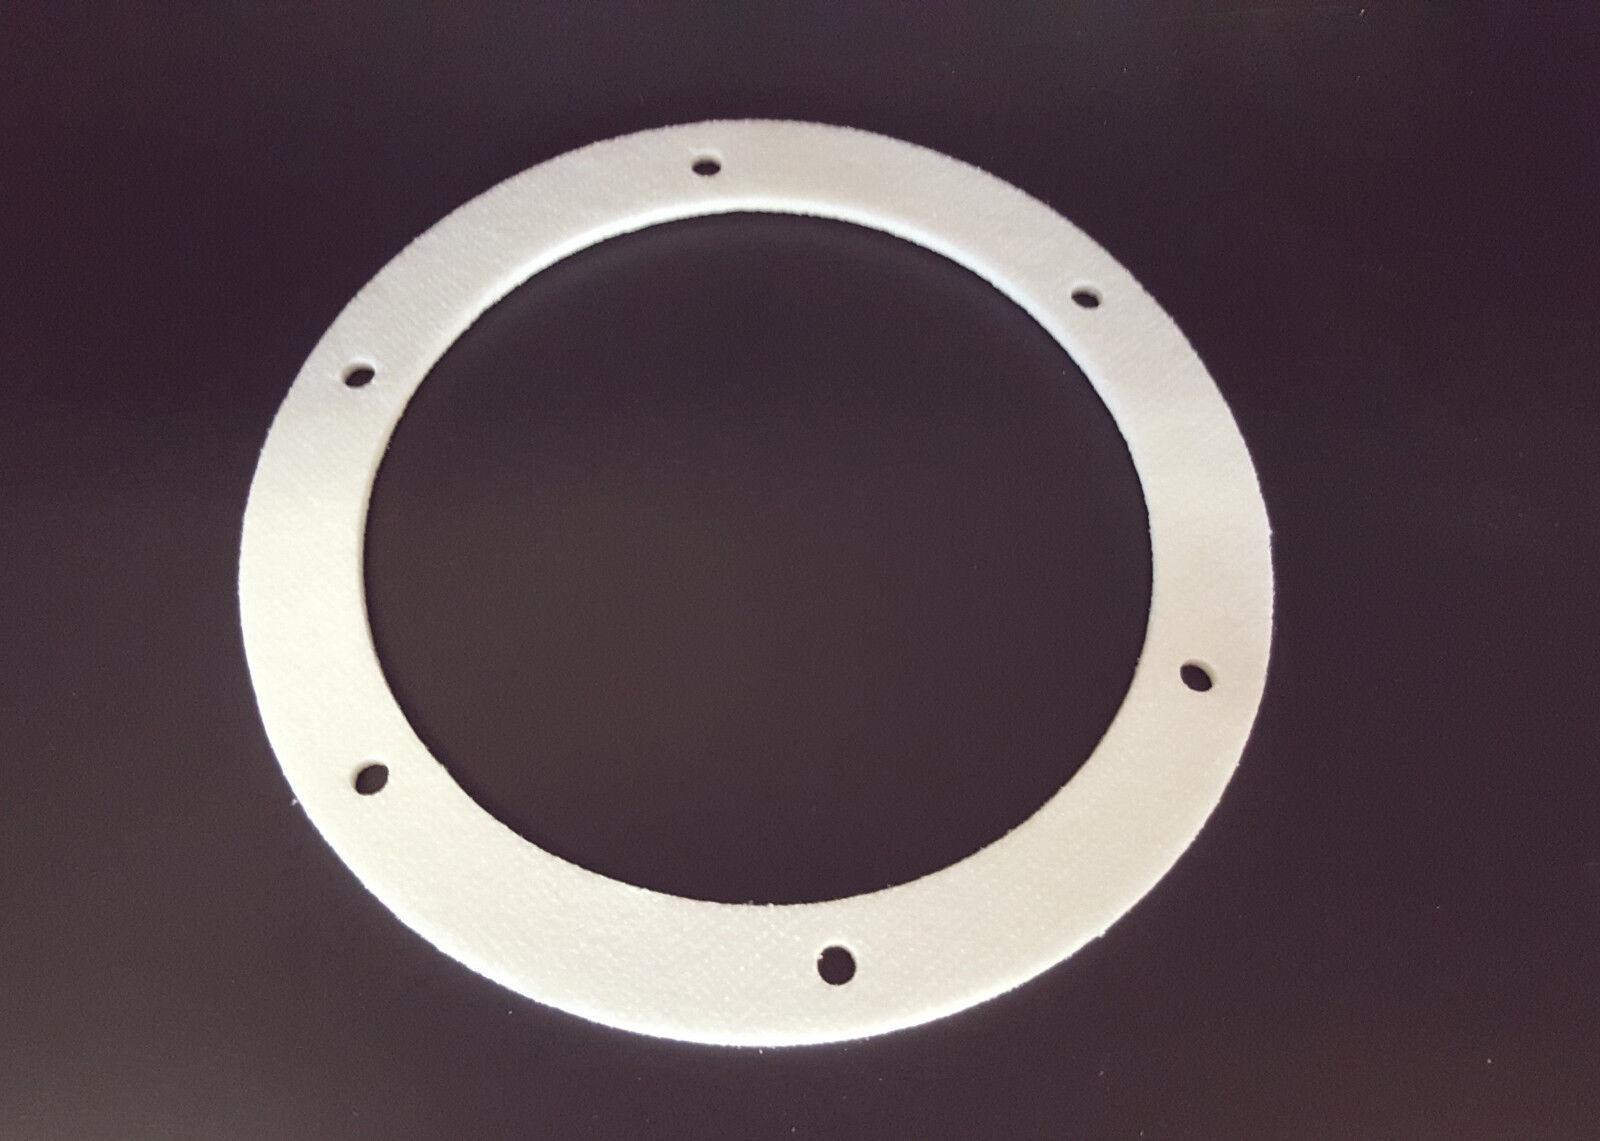 Bixby Pellet Stove Combustion Exhaust Blower Motor Fan Kit + 4 3/4 ...